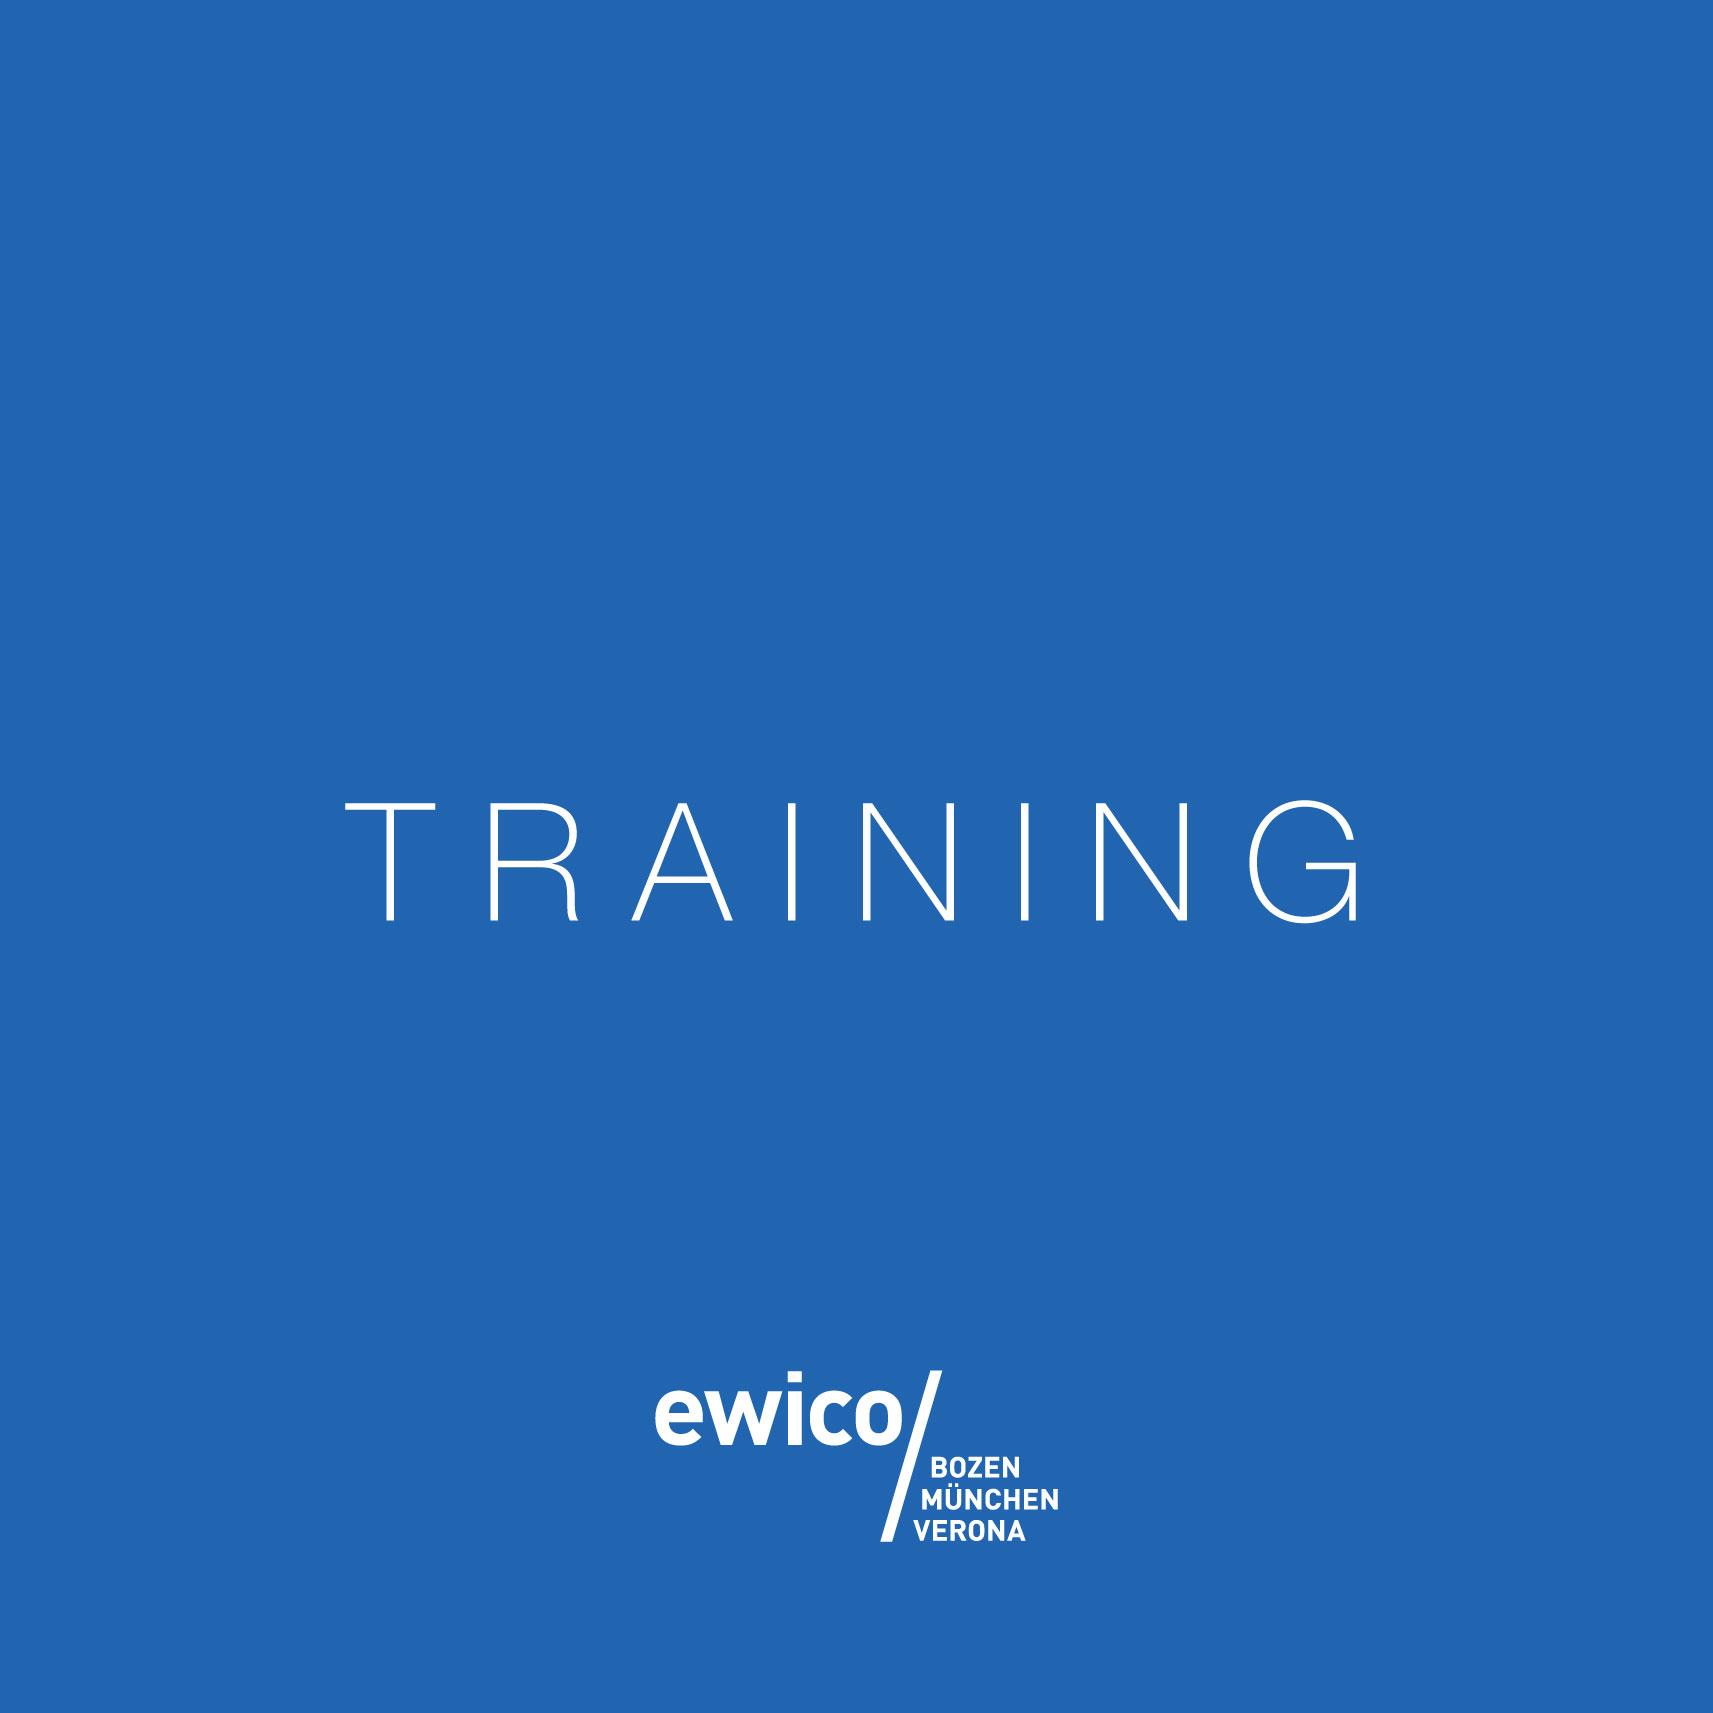 Offene Trainings 2019 Ewico